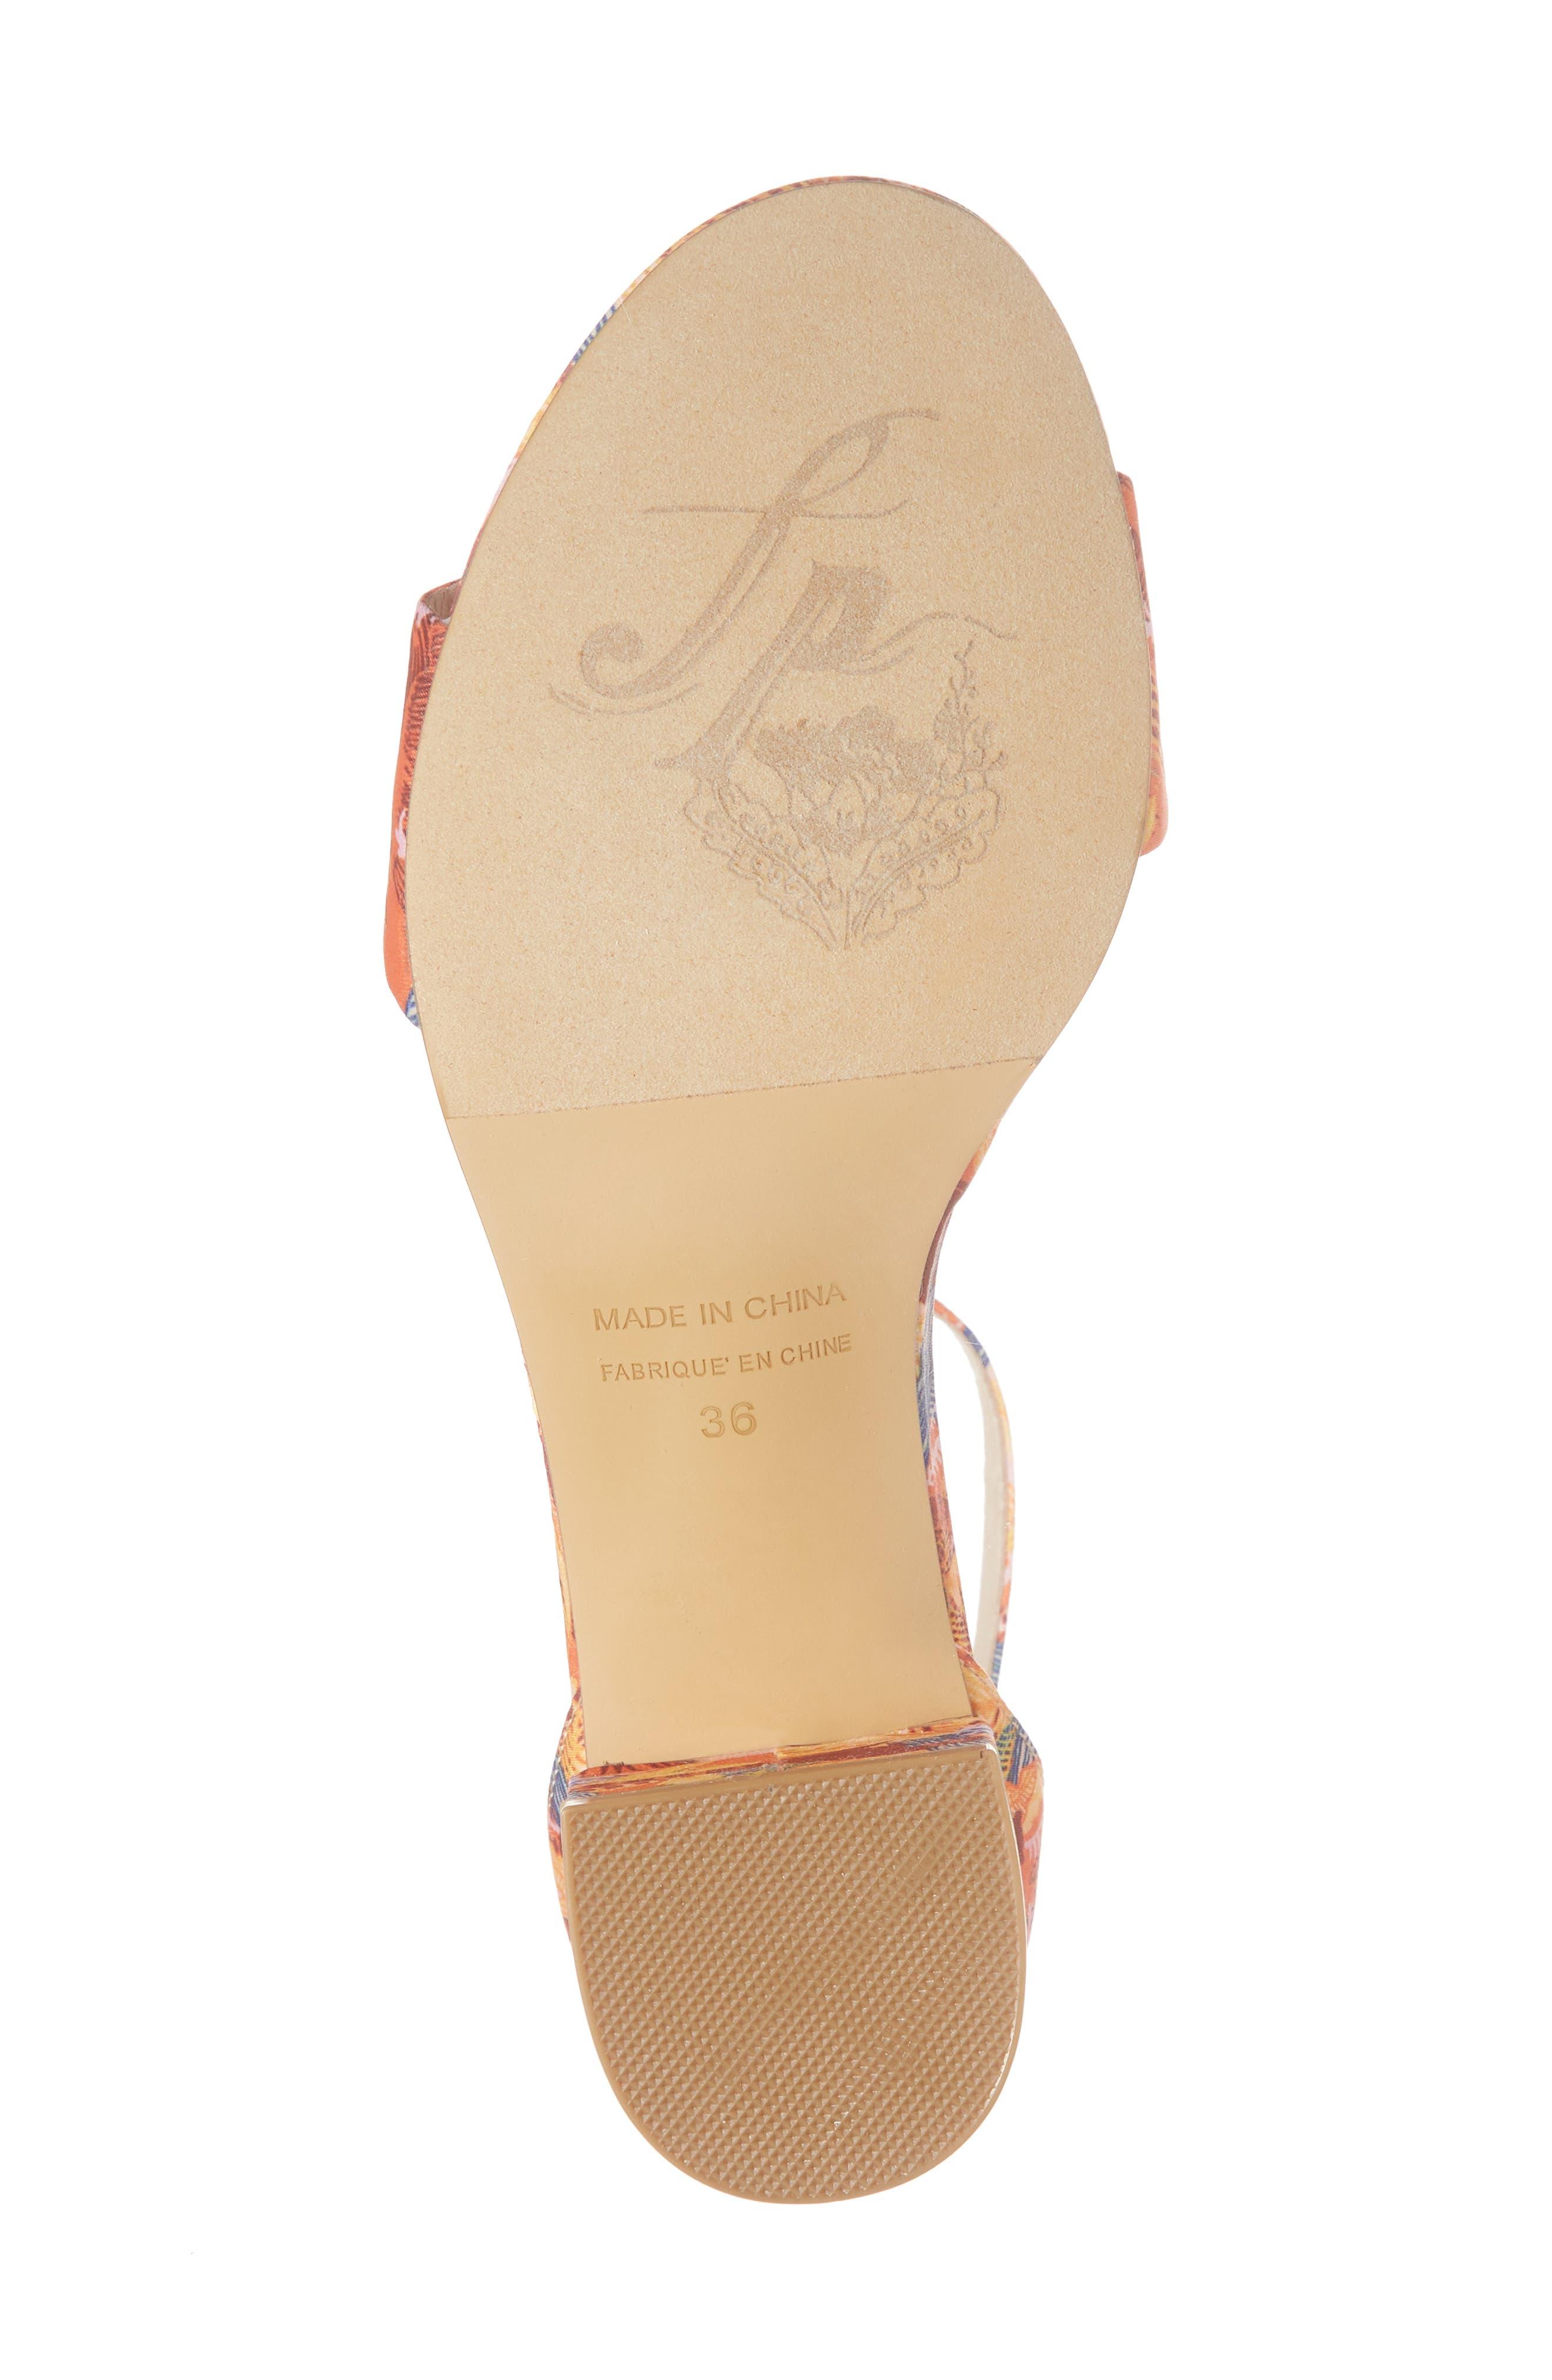 Marigold Block Heel Sandal,                             Alternate thumbnail 6, color,                             Orange Combo